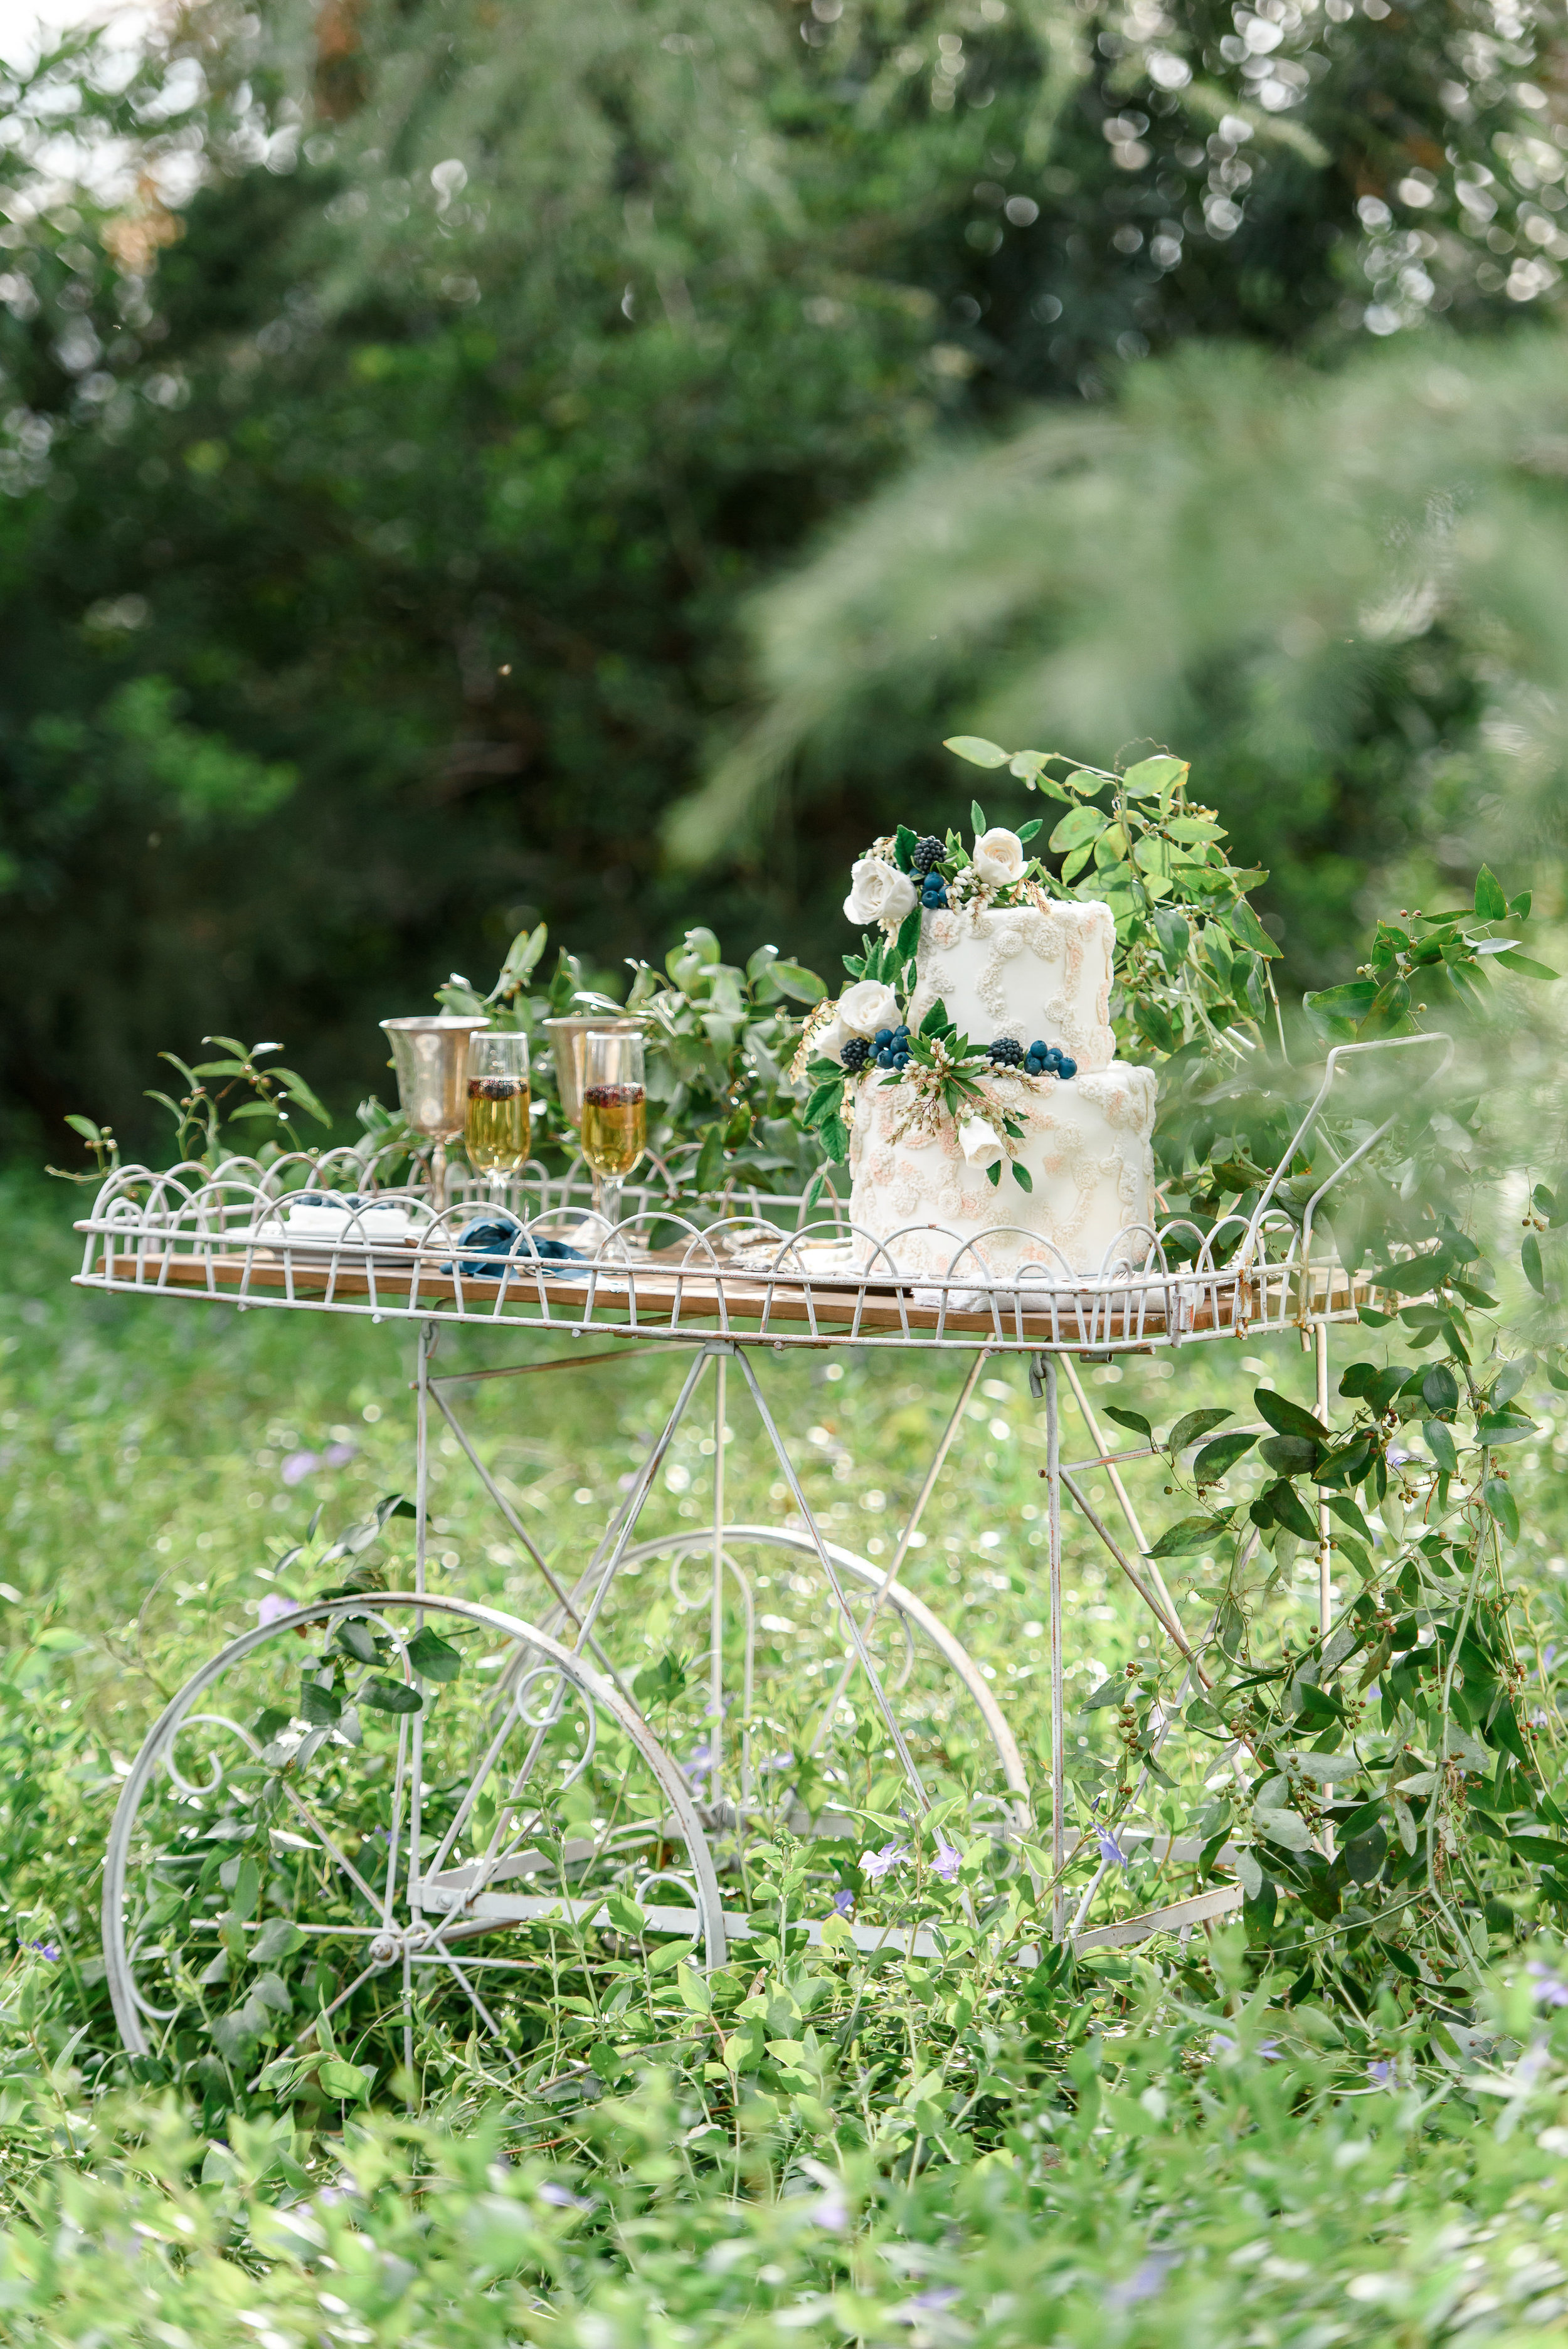 Garden Wedding Inspiration | Cake Display | Wedding Cake